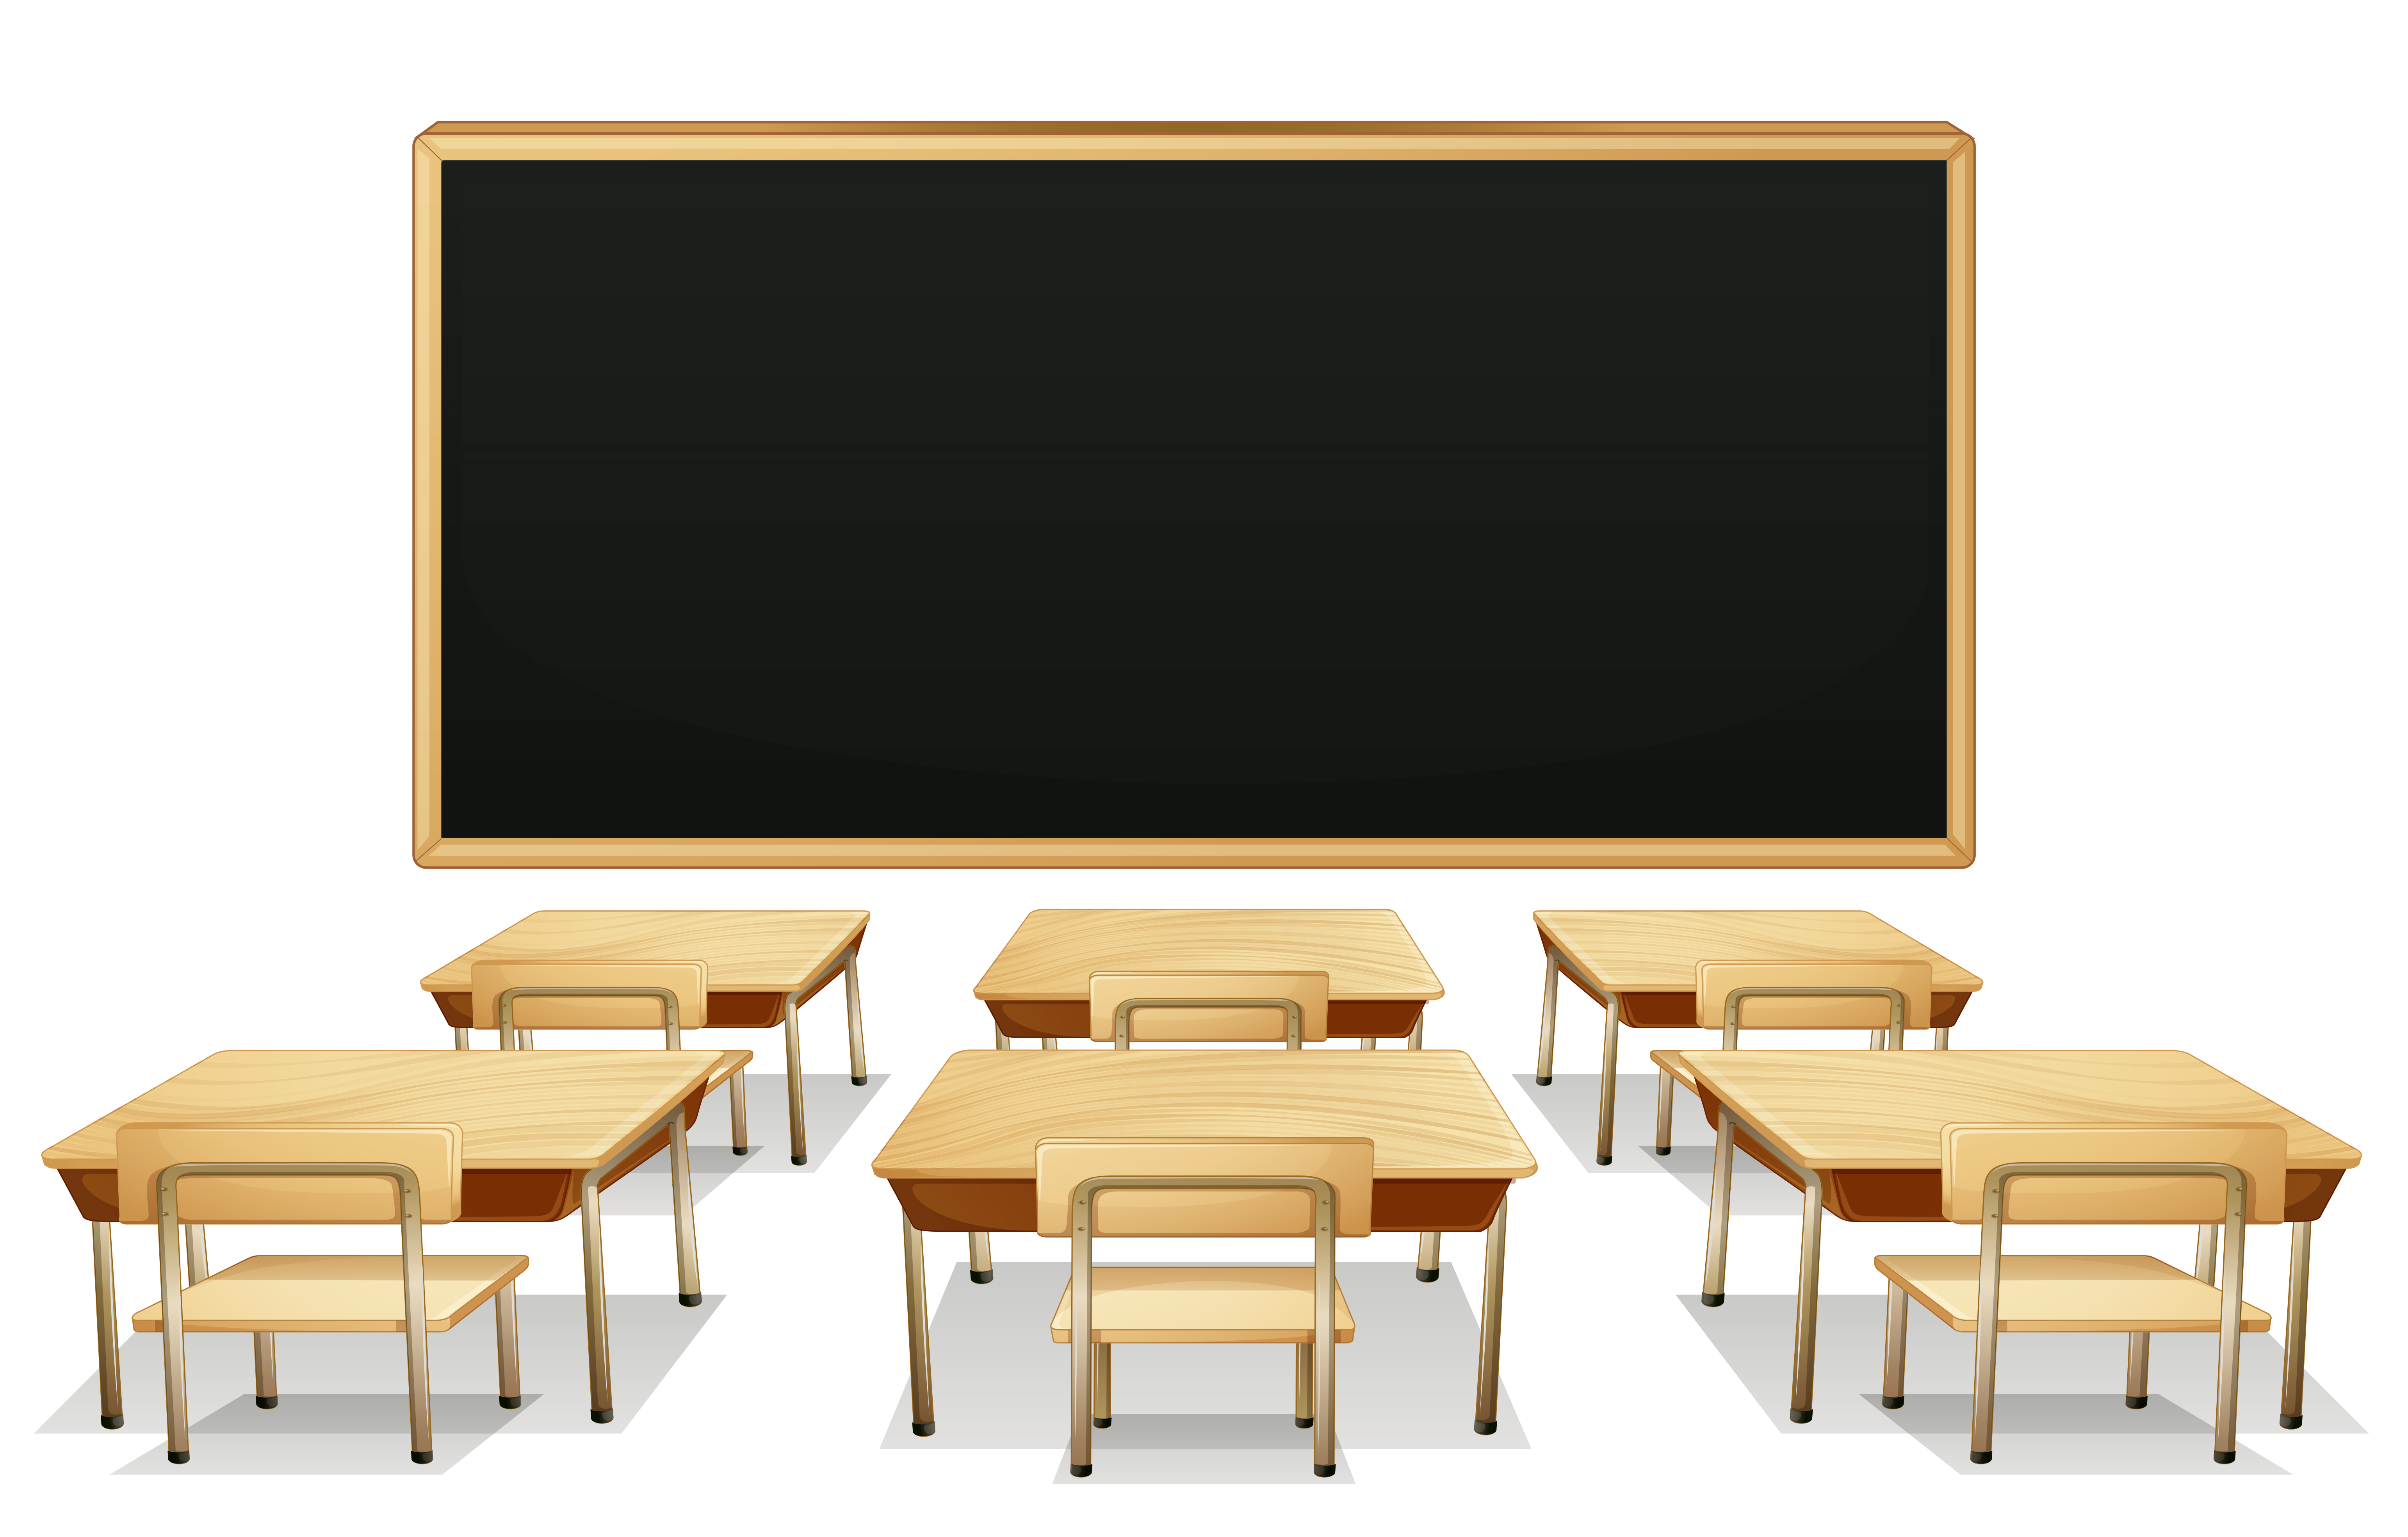 School window clipart clip art freeuse download School Classroom with Blackboard and Desks PNG Clipart Picture ... clip art freeuse download